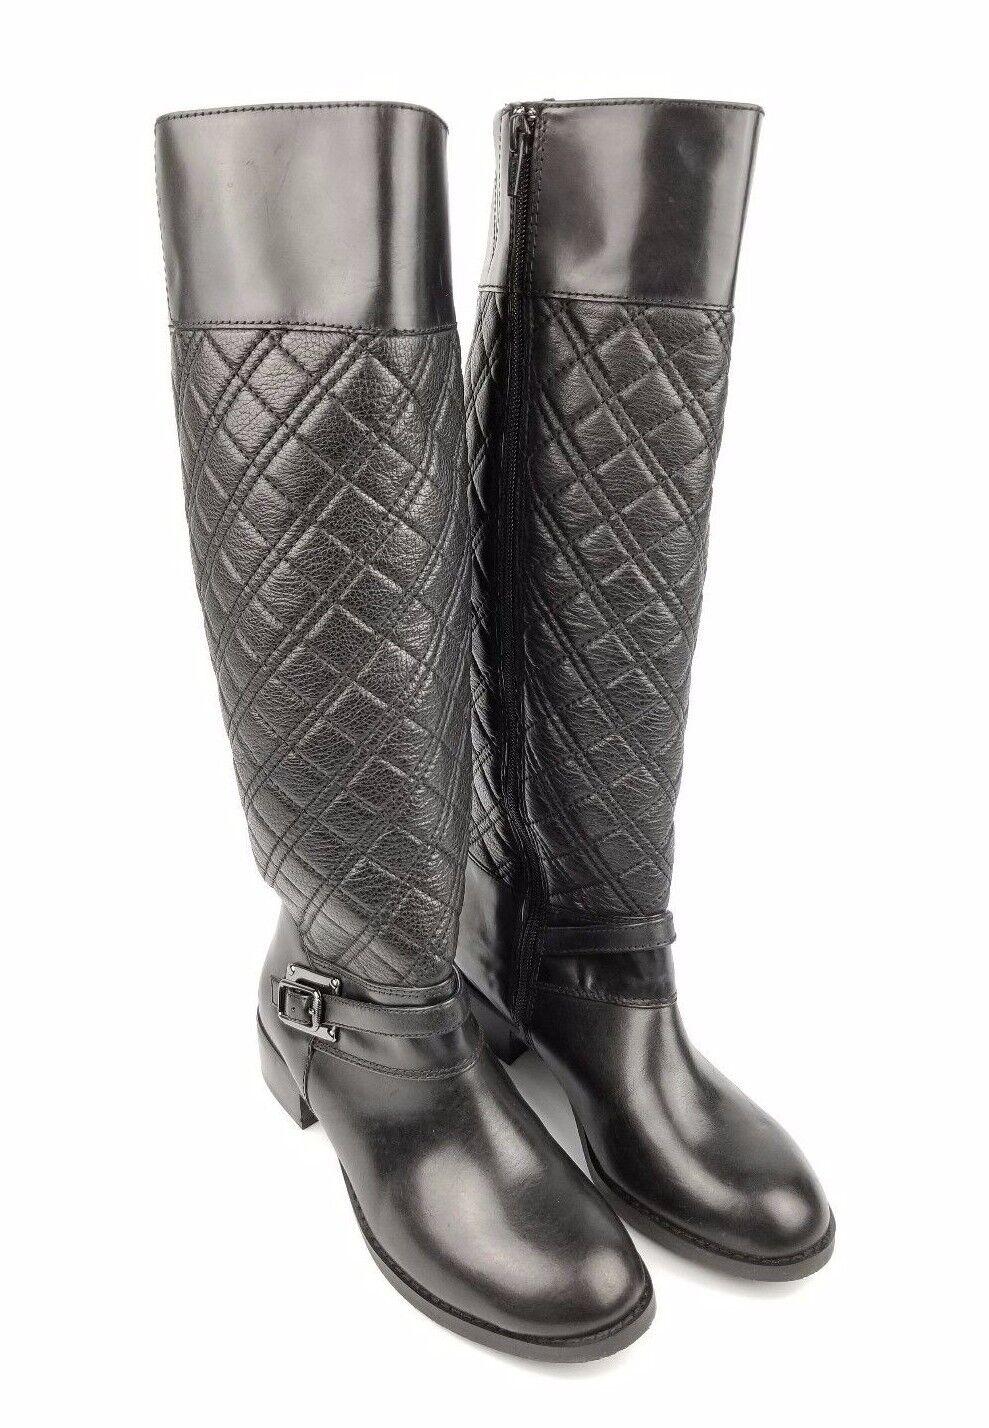 Alex Marie Sz 6 M Genuine Leather Black Diamond Stitching Knee High Boots HGD